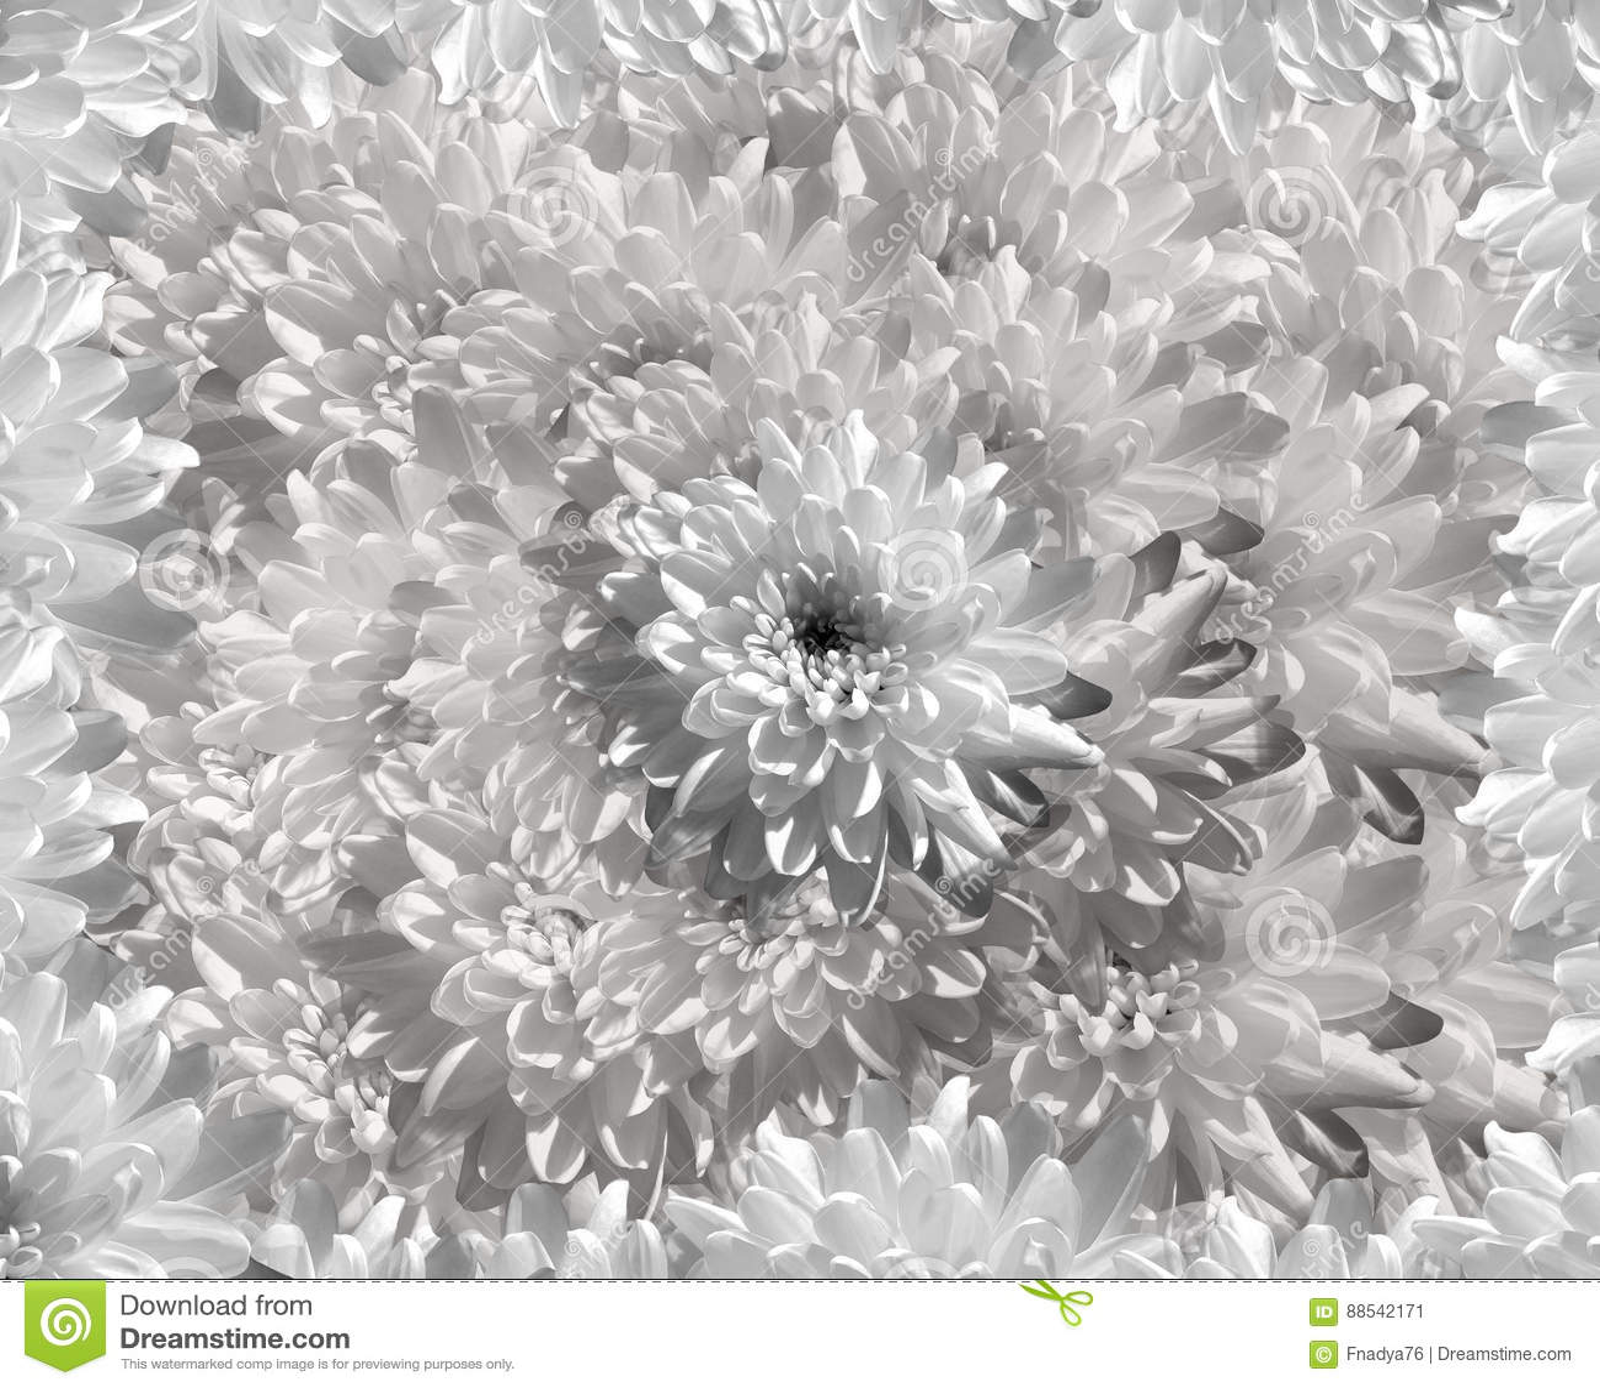 Flower On Gray White Background Petals Chrysanthemum White Flowers